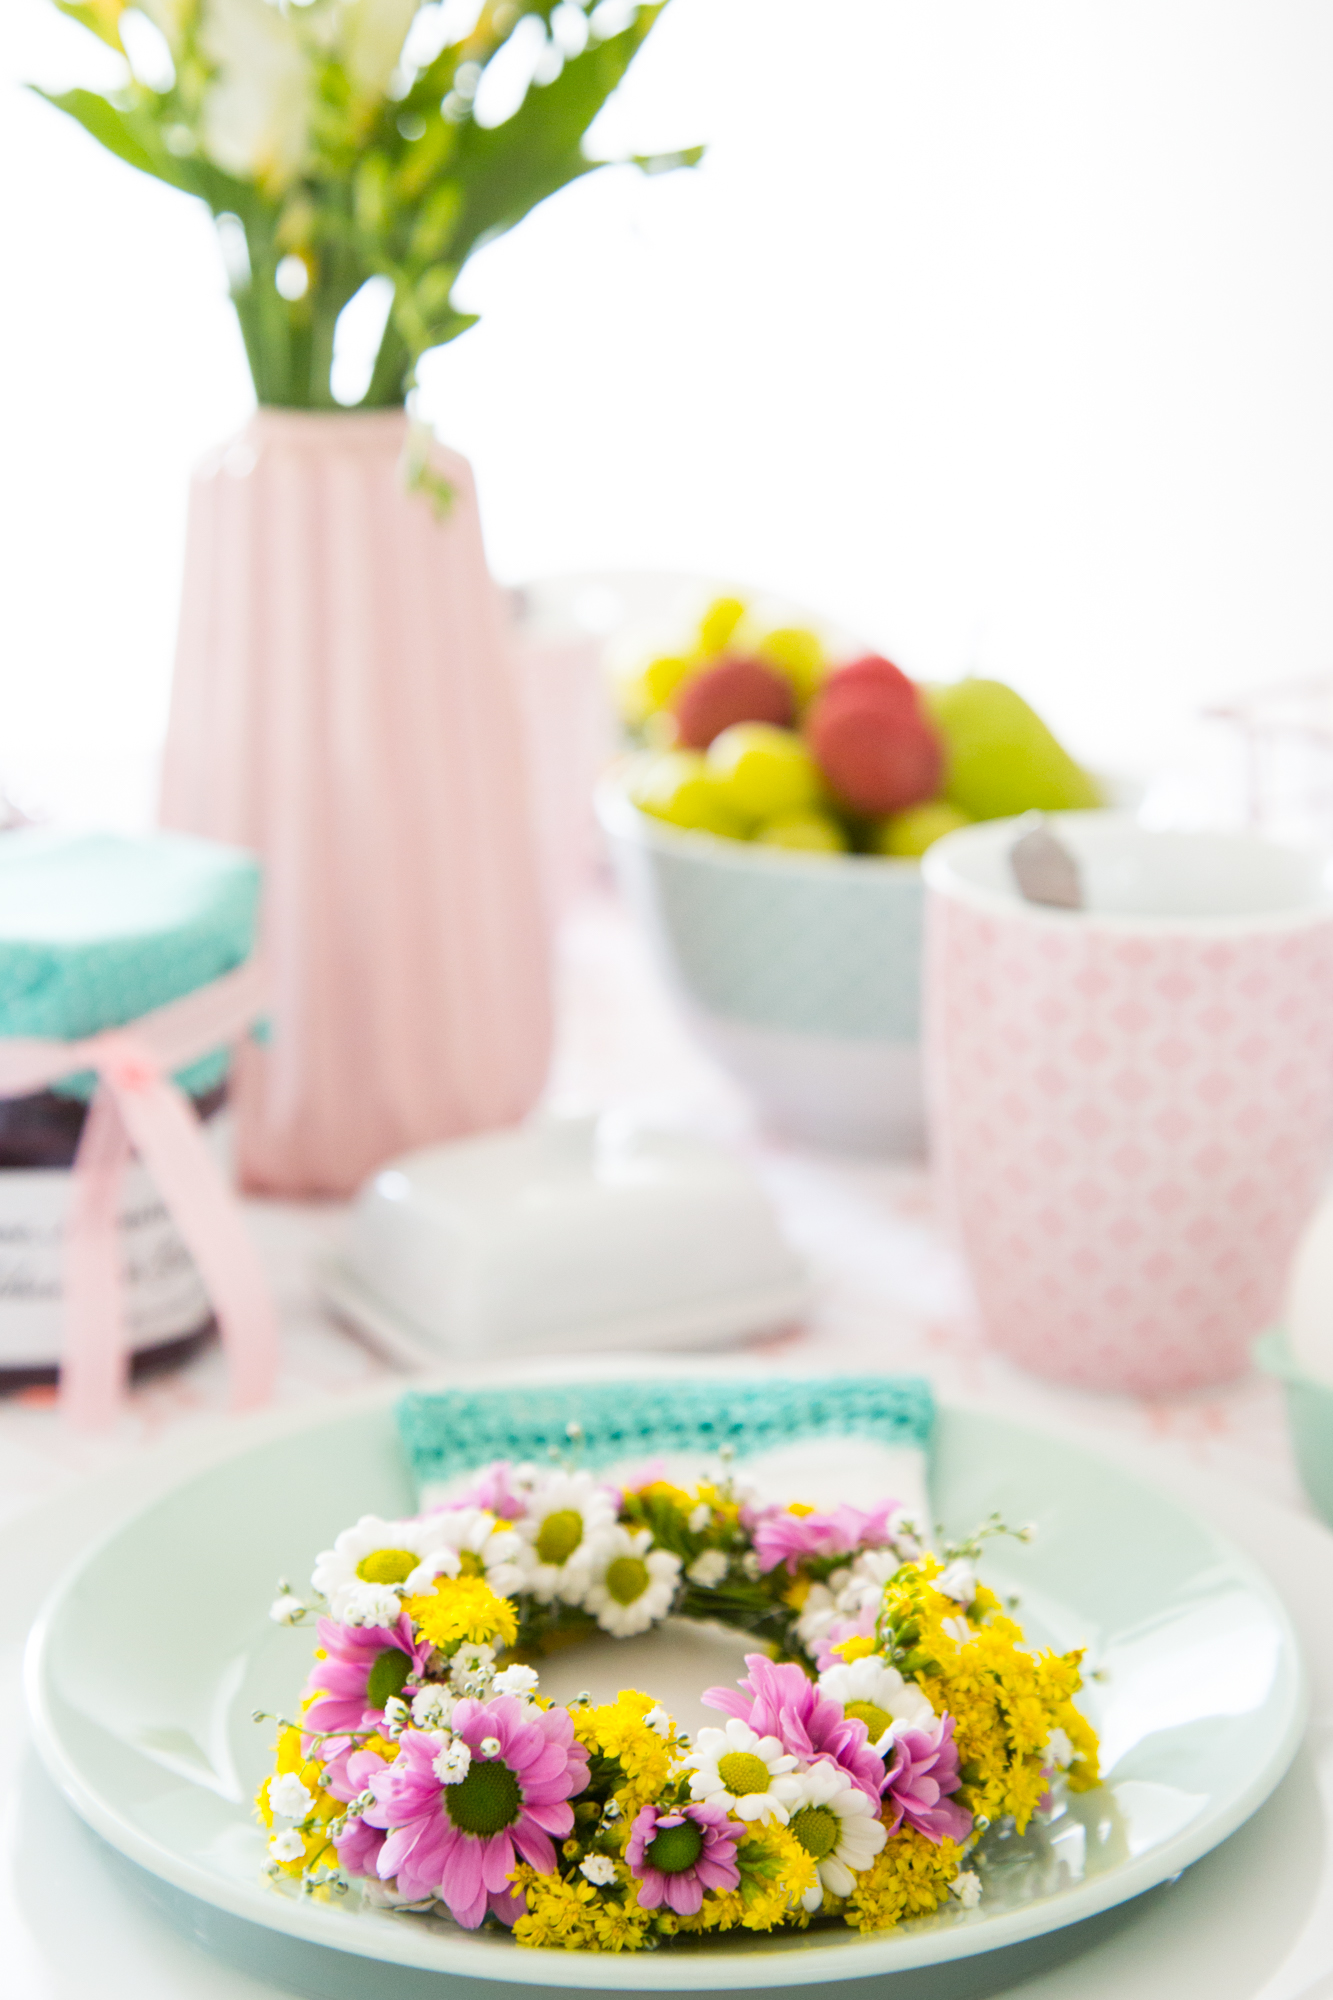 Blumenkranz Fruhlingsstimmung Auf Dem Tisch Schon Bei Dir By Depot